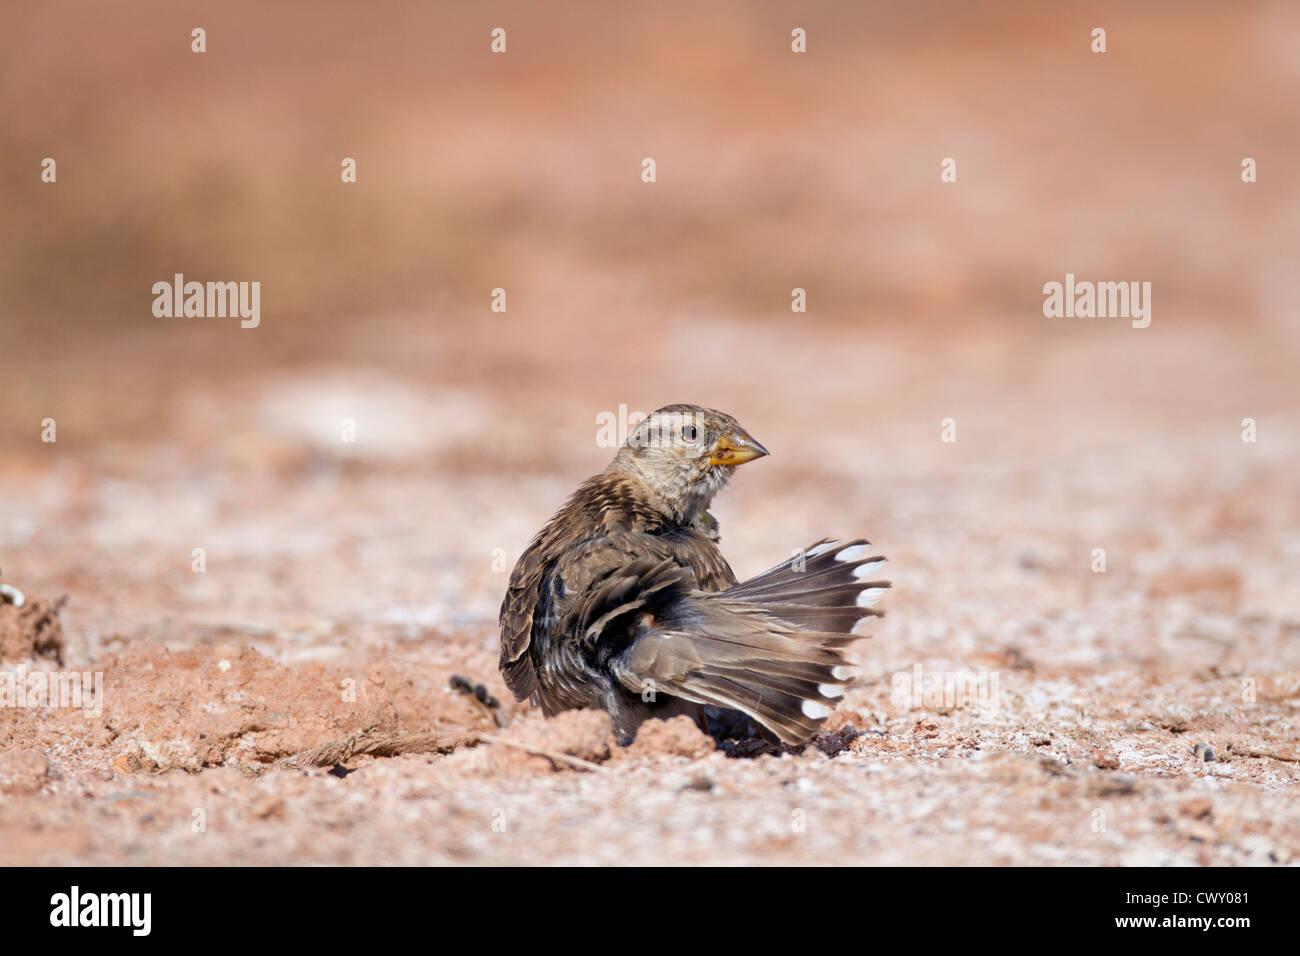 Rock Sparrow; Petronia petronia; dust bathing; Spain; summer - Stock Image